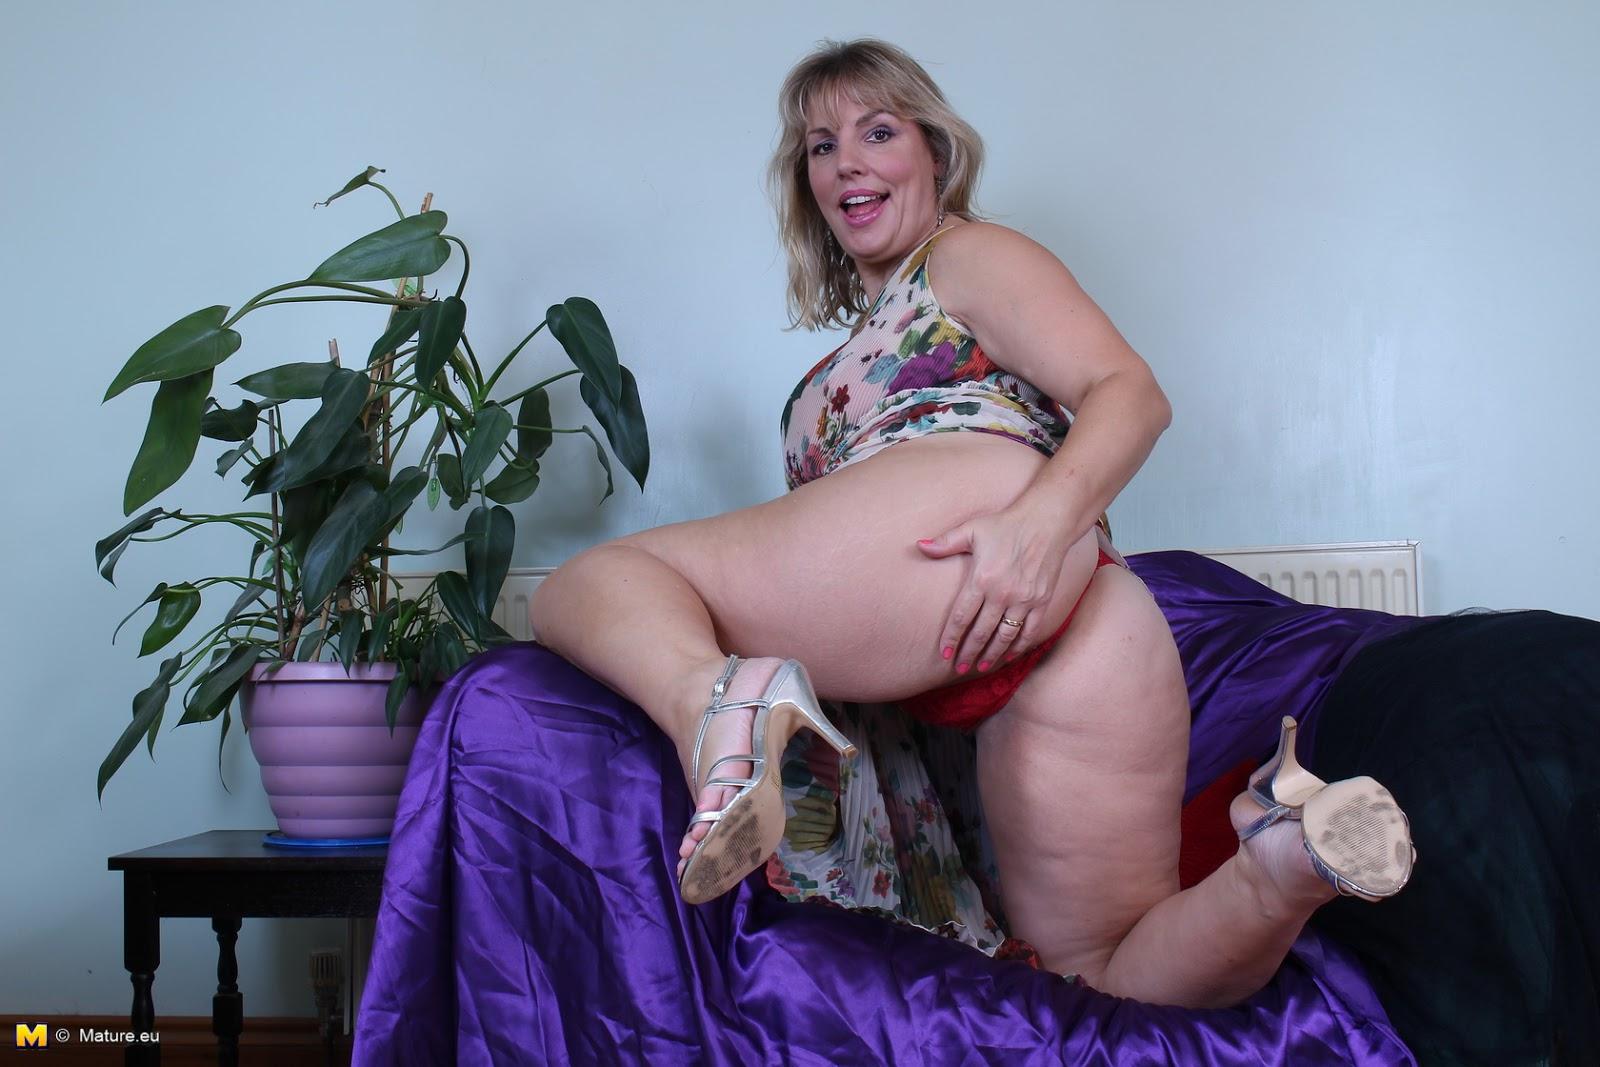 Mature women undressing pics-7946